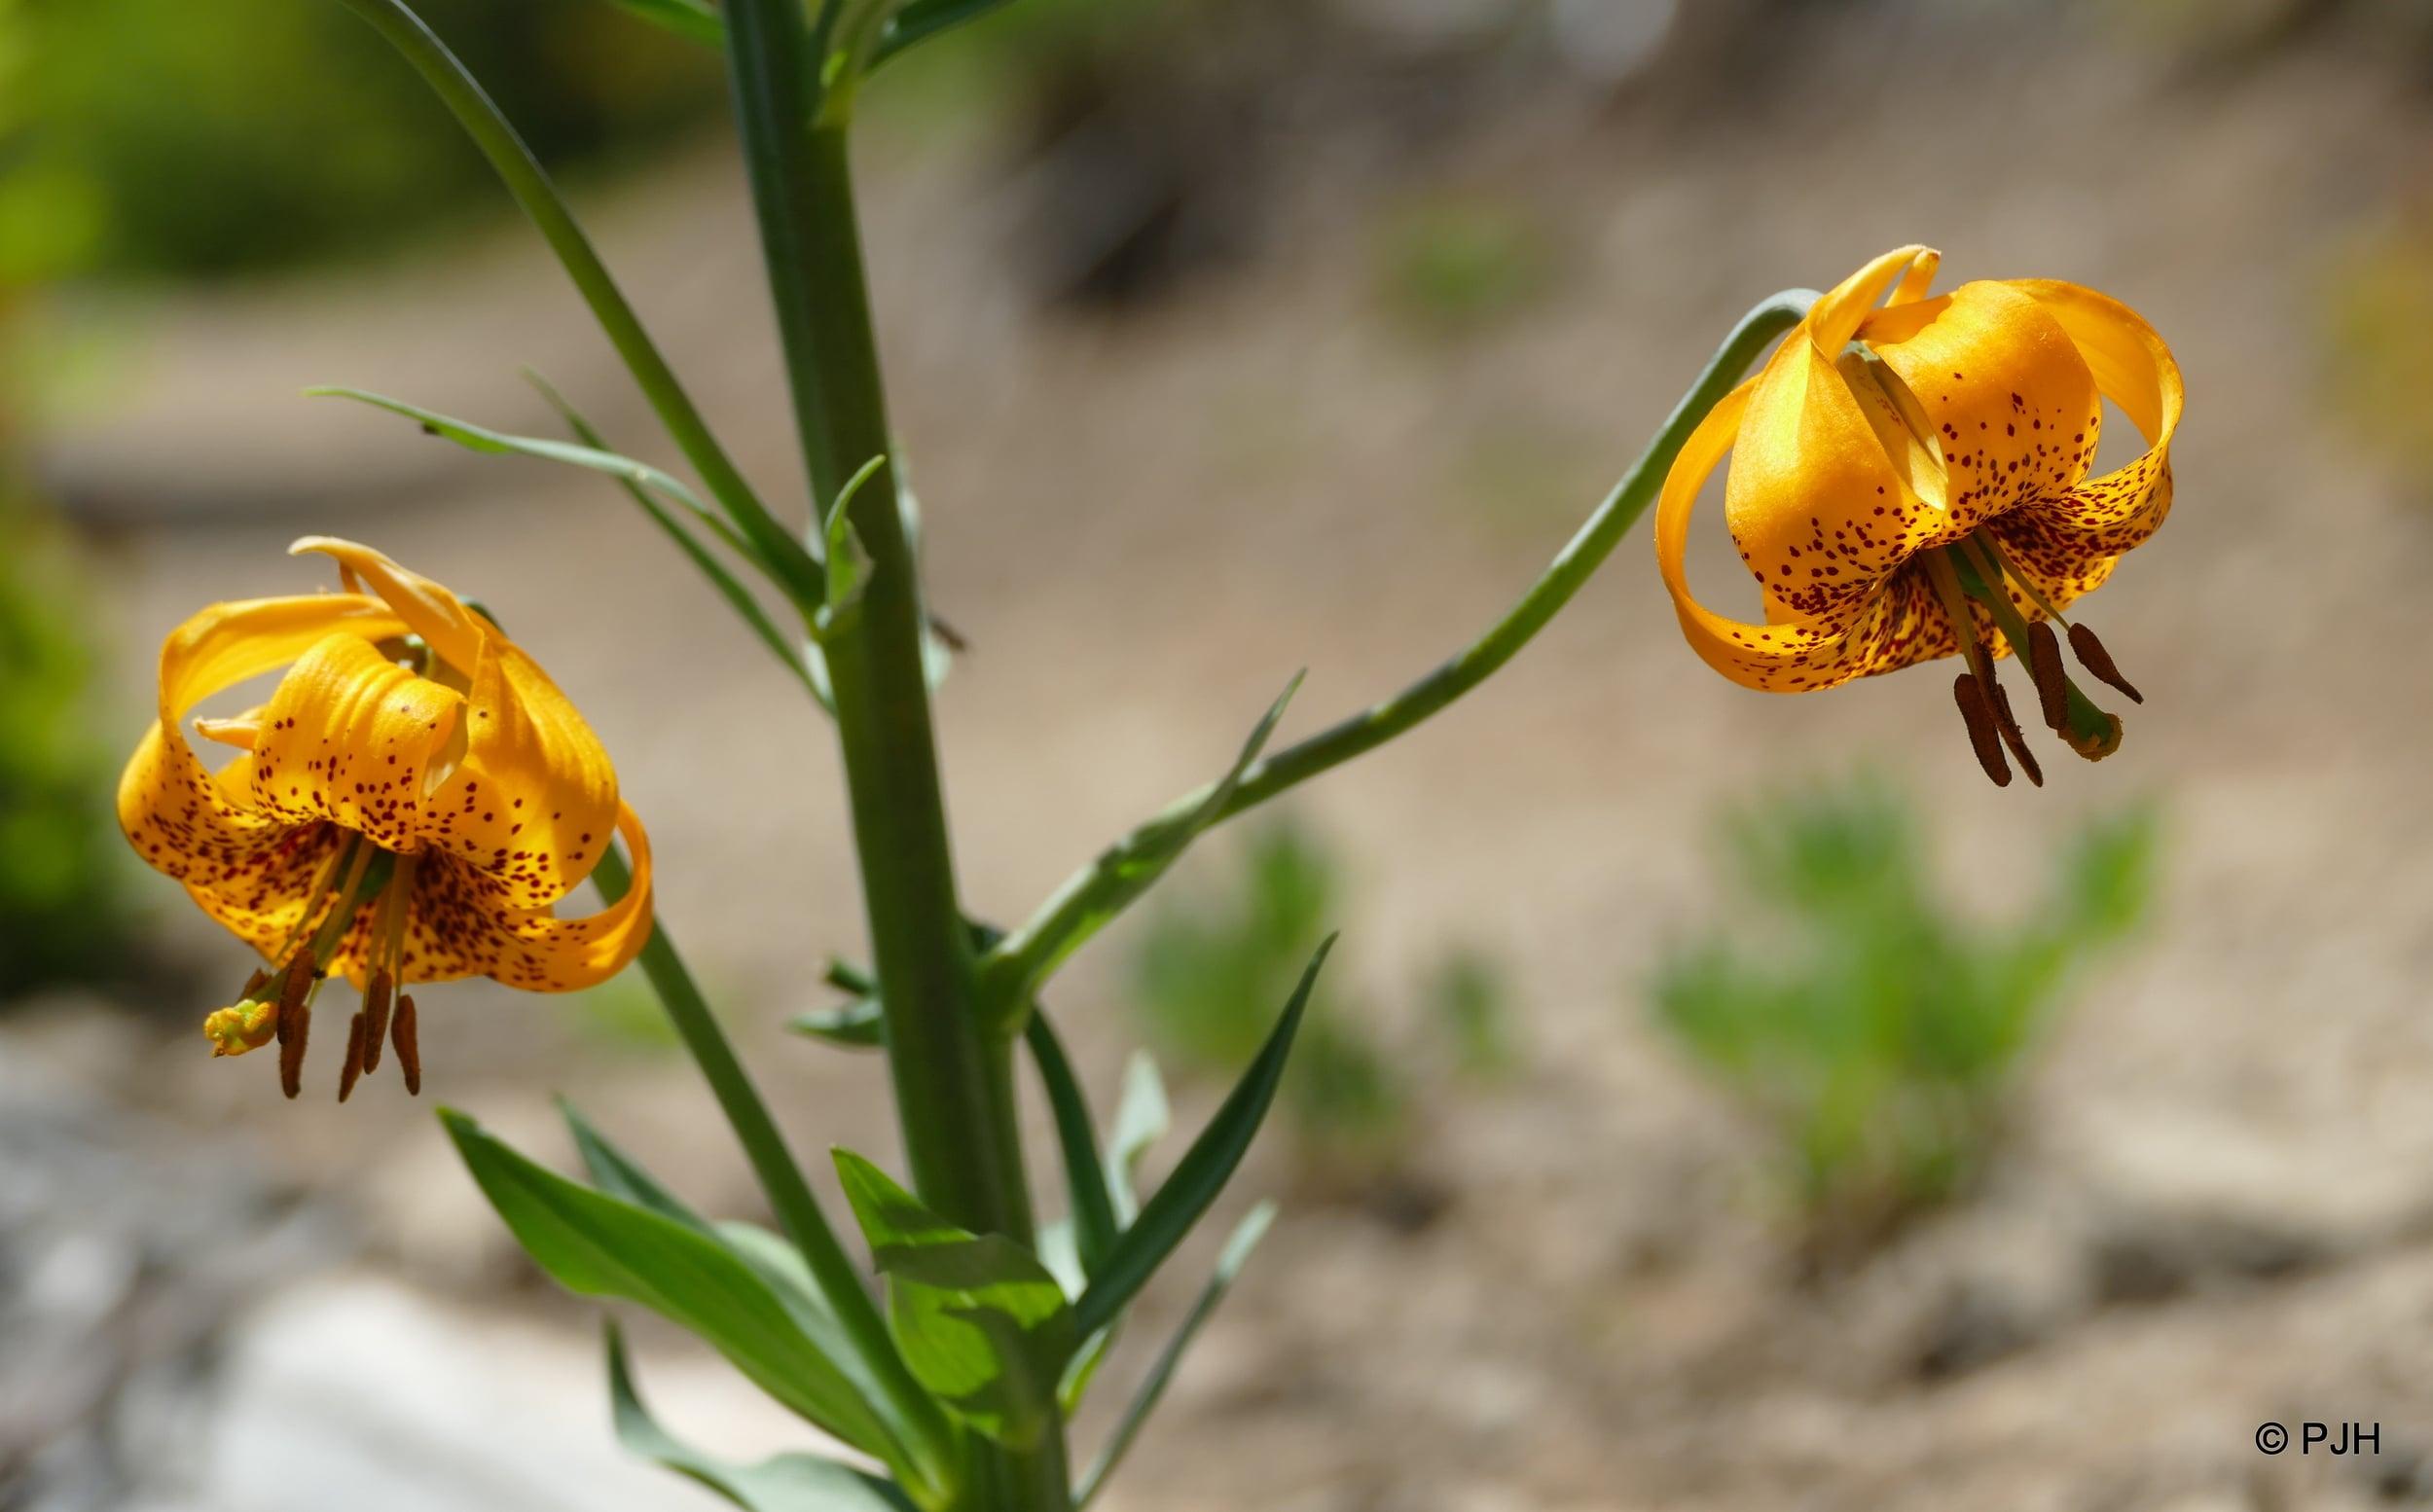 Wild Tiger Lily's - Olympic NP, WA, USA.